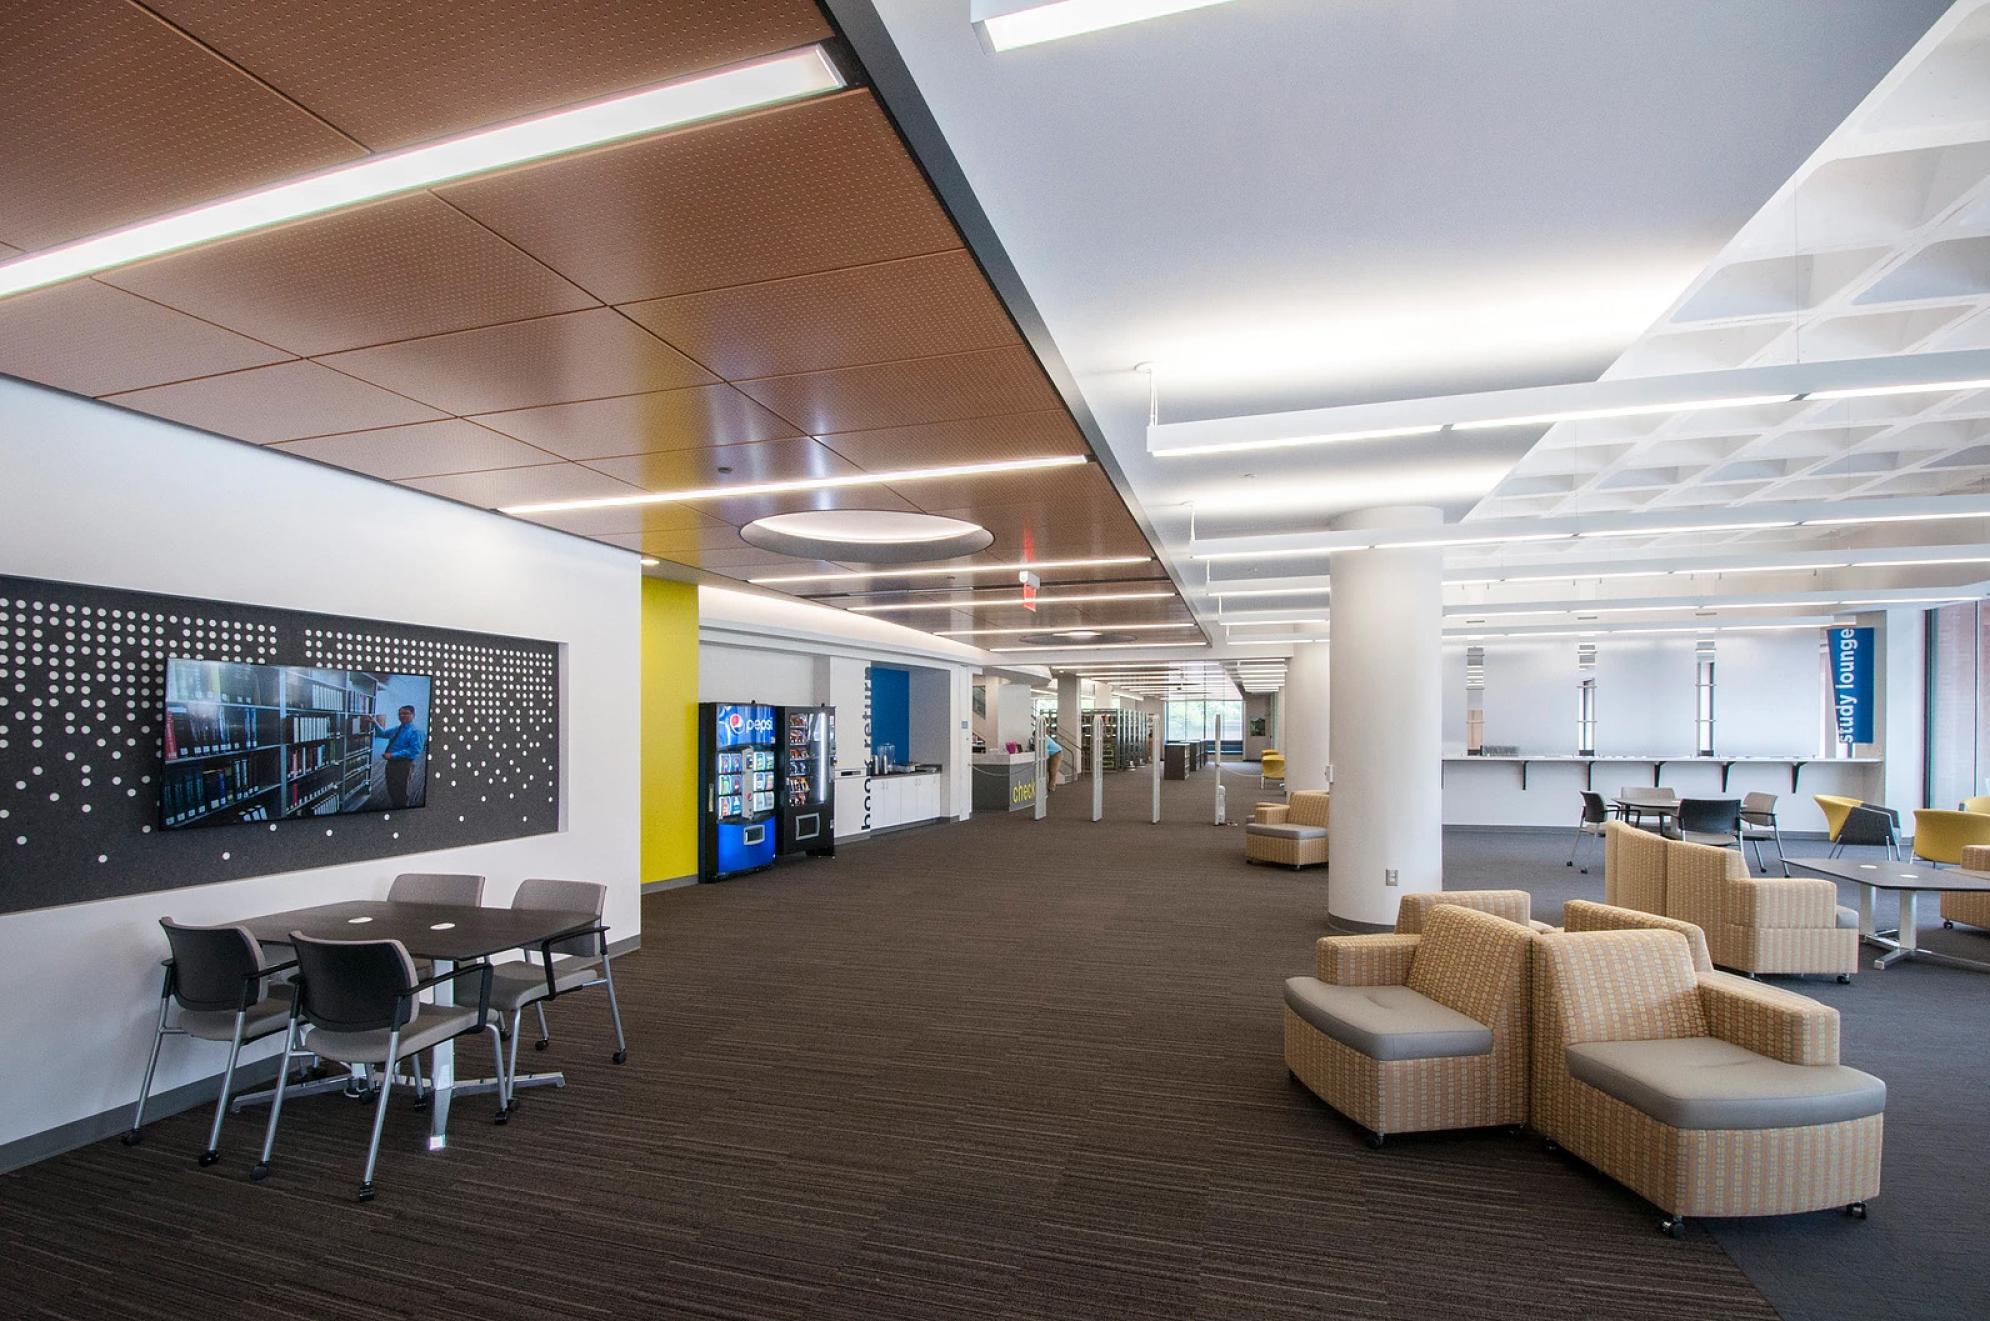 gsc hightower library lobby